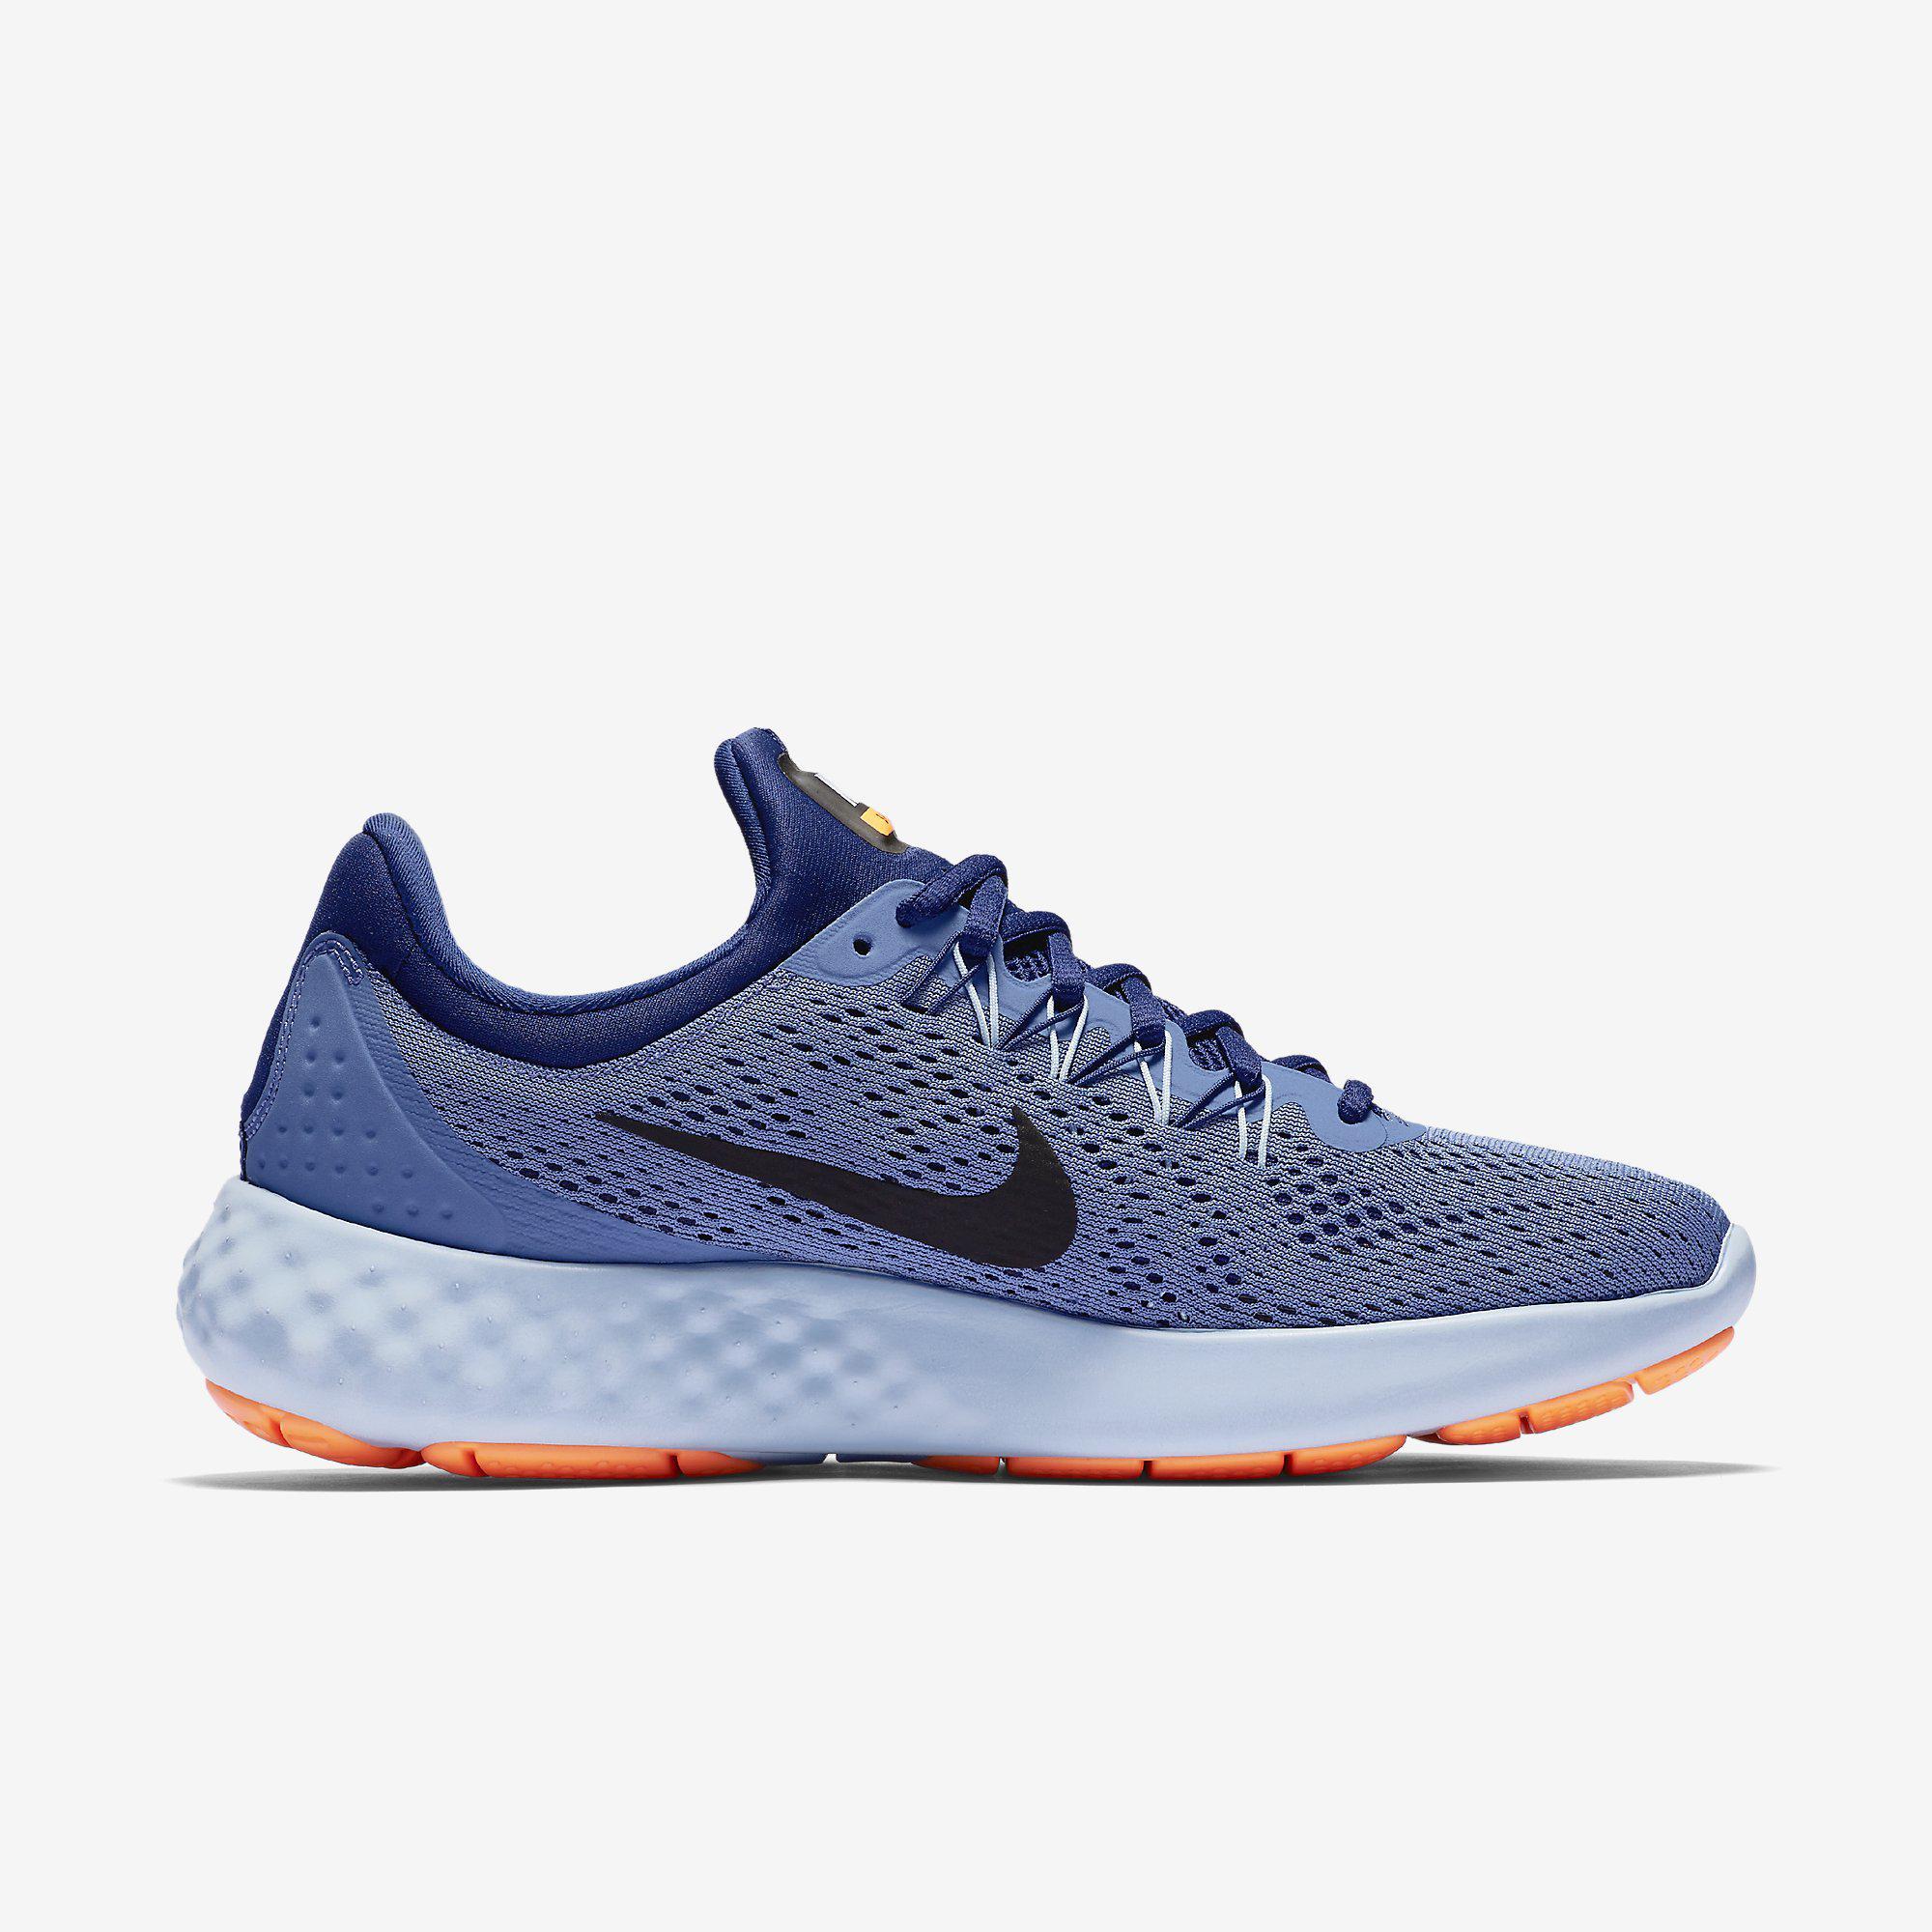 Nike Mens Lunar Skyelux Running Shoes - Blue Moon